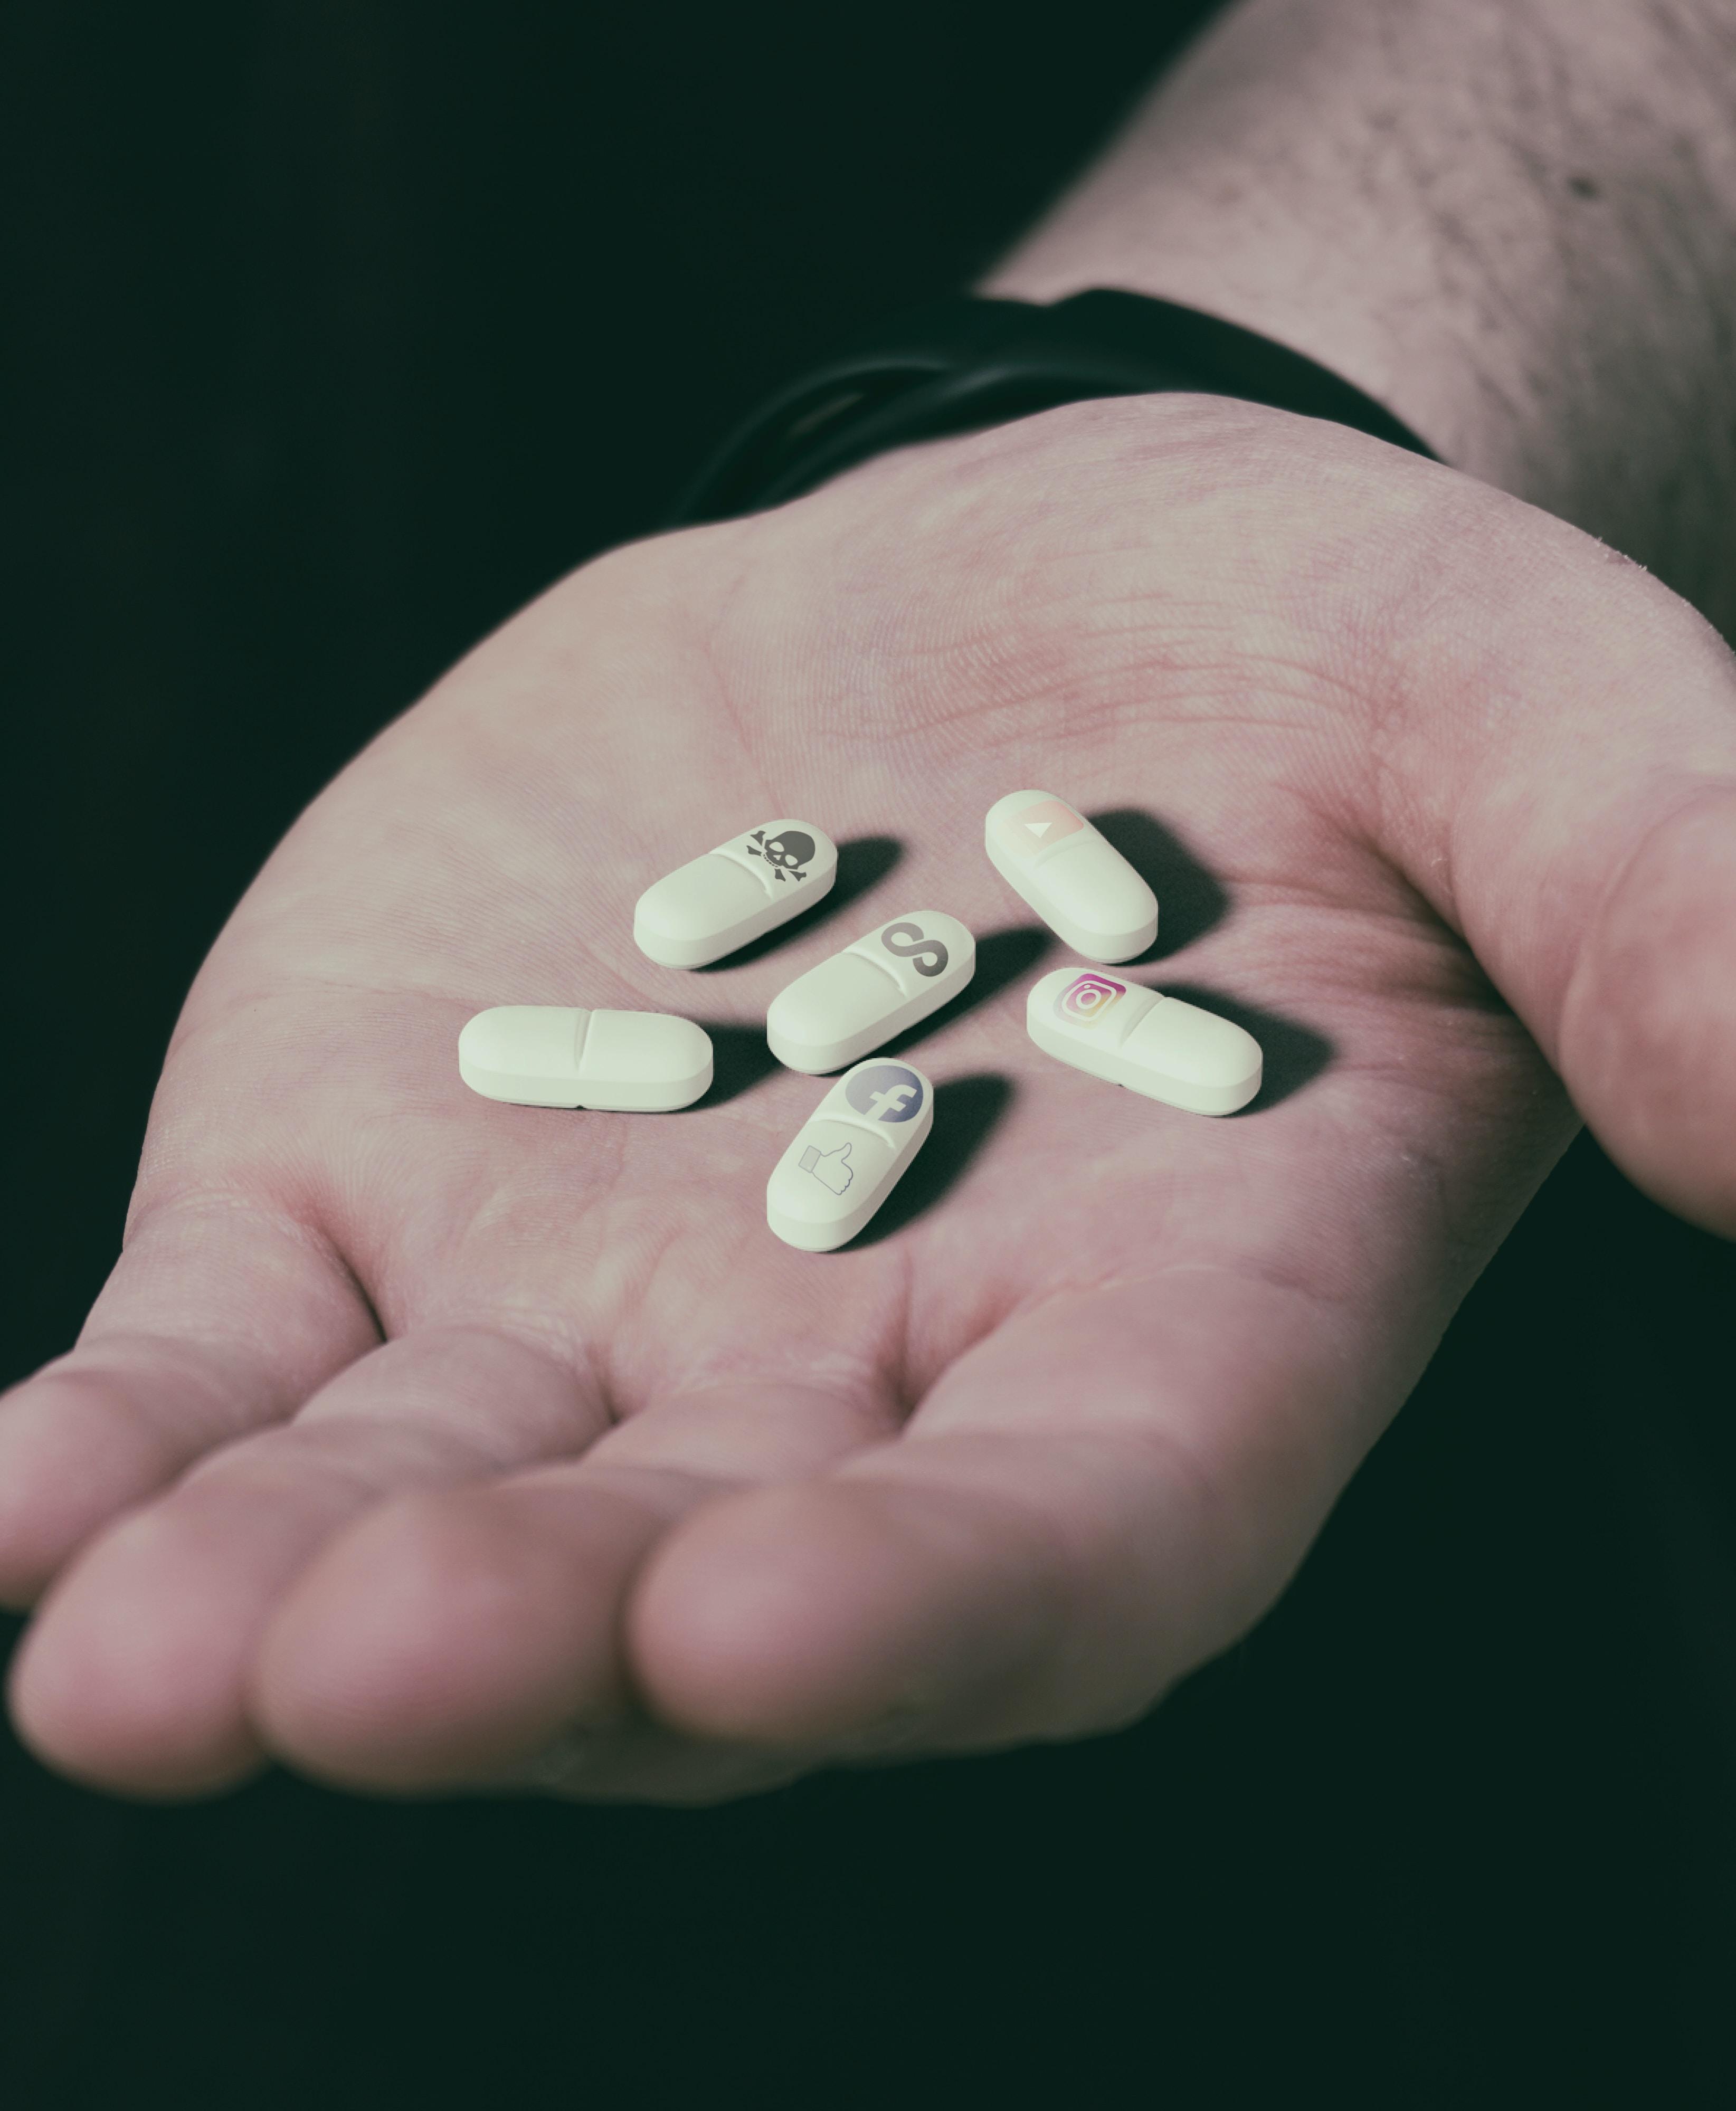 six white medication pills on hand